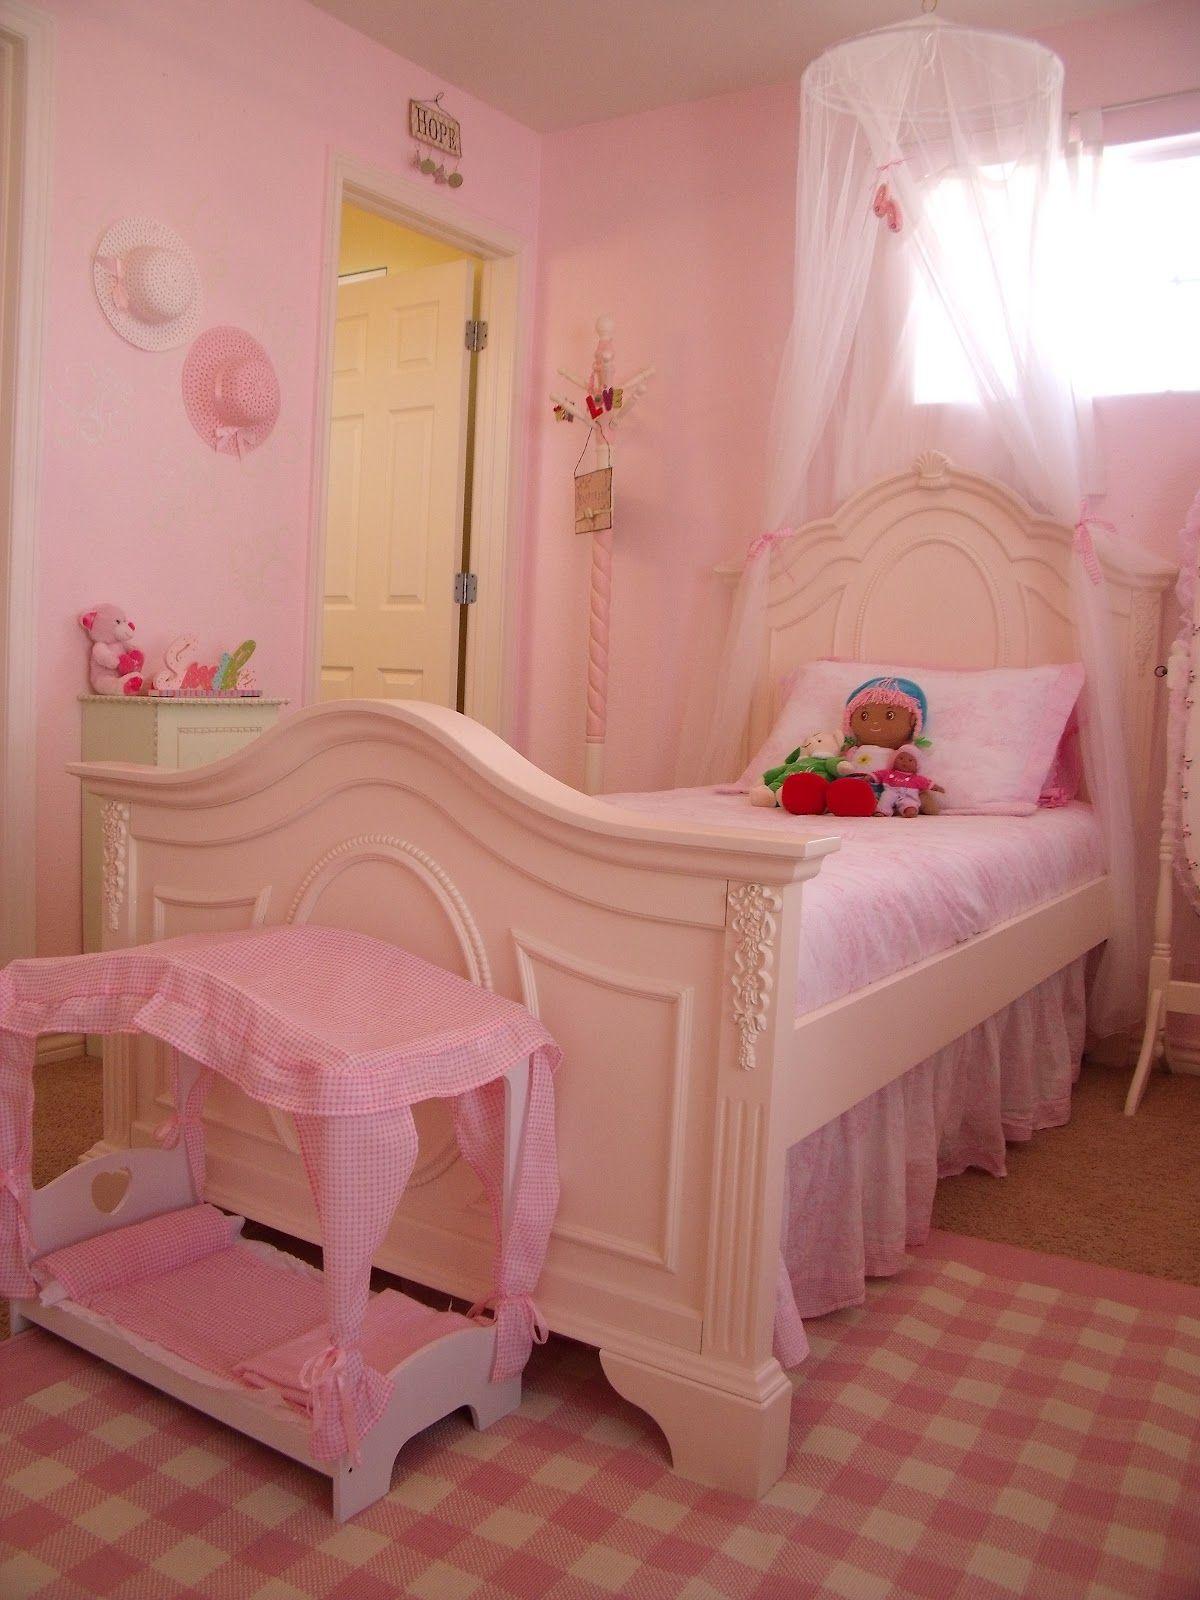 Girls Room 008 Jpg 1 200 1 600 Pixels Bed For Girls Room White Wooden Bed Room